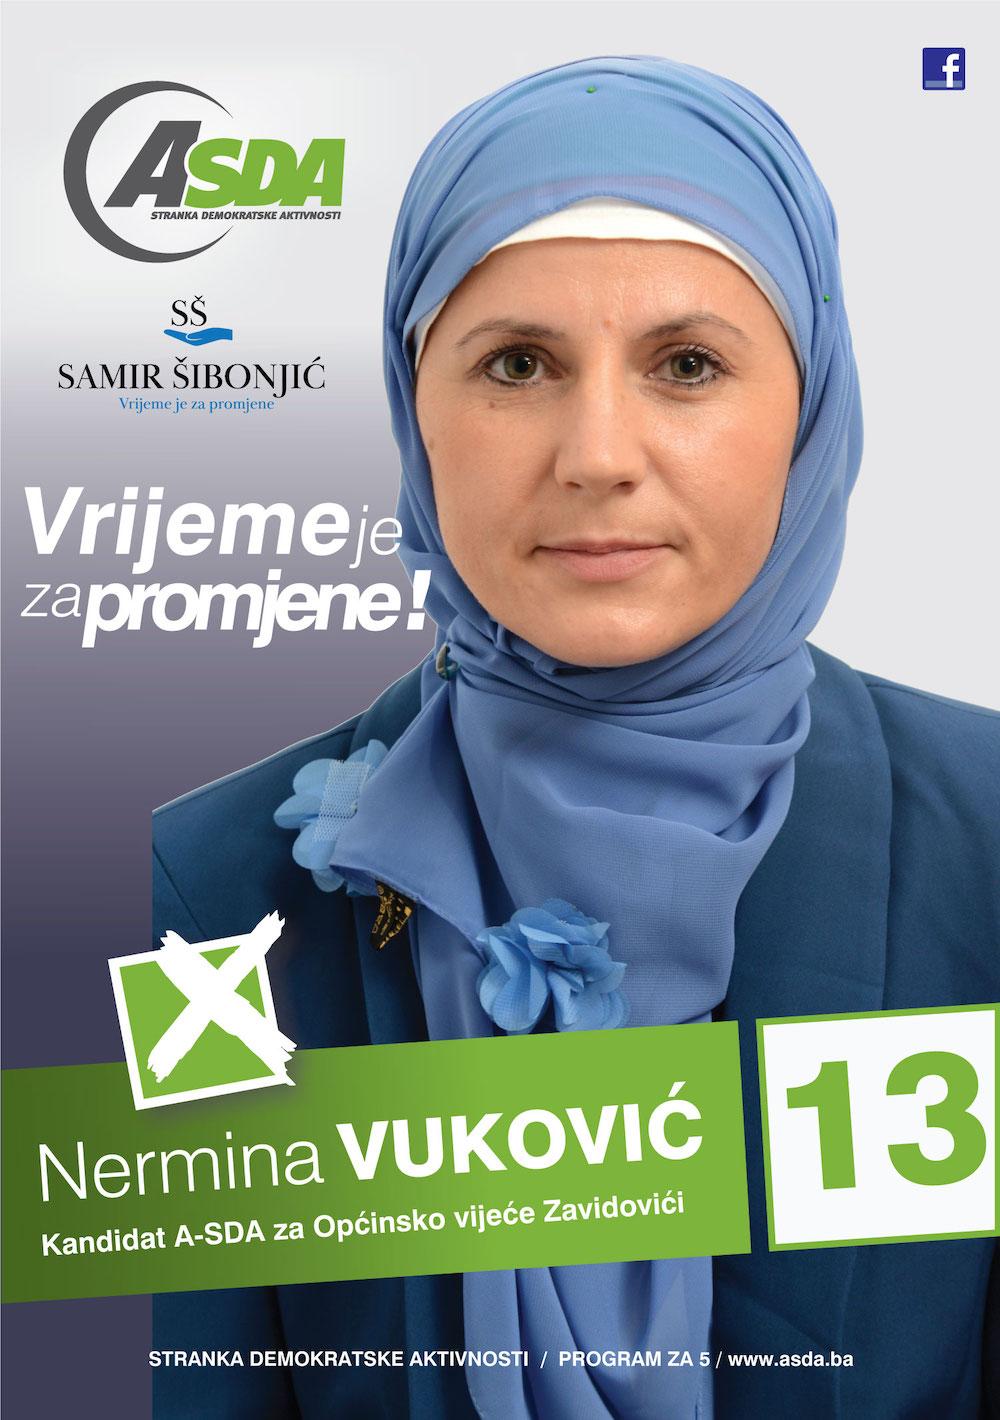 Nermina Vuković